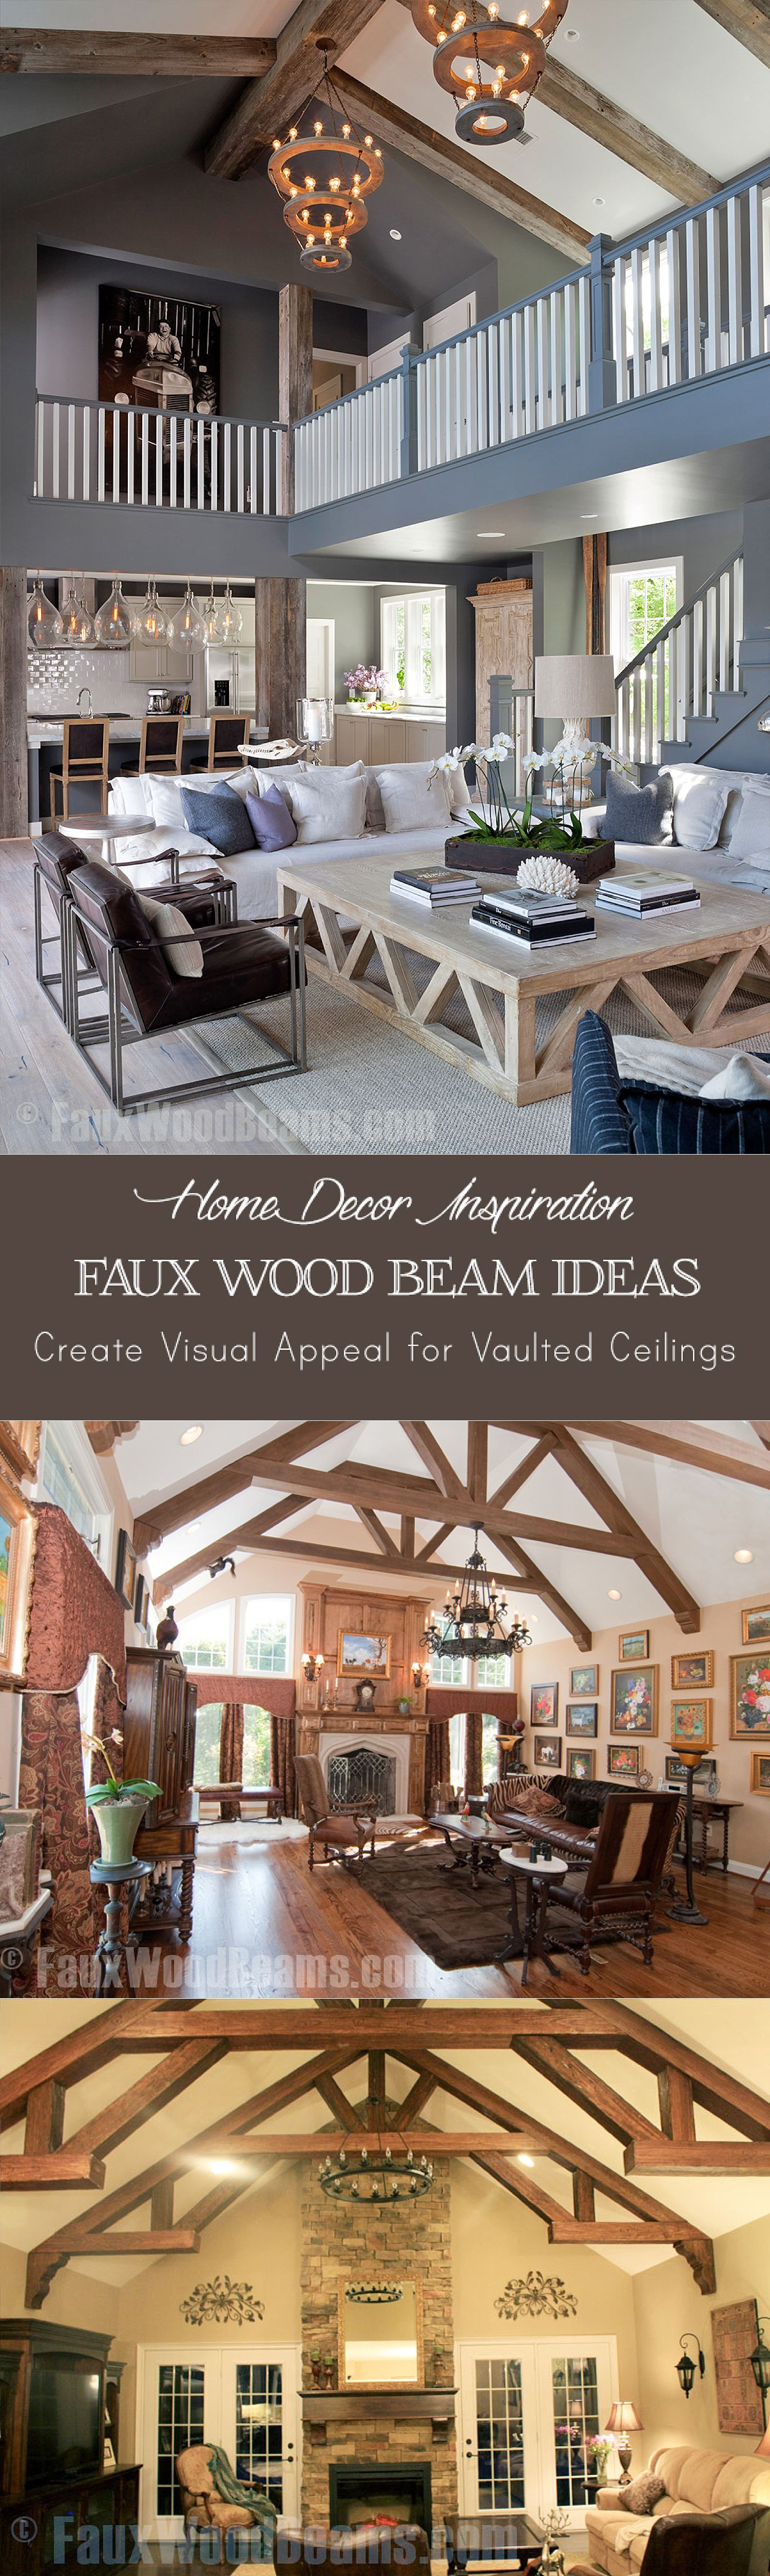 faux-wood-beam-inspiration